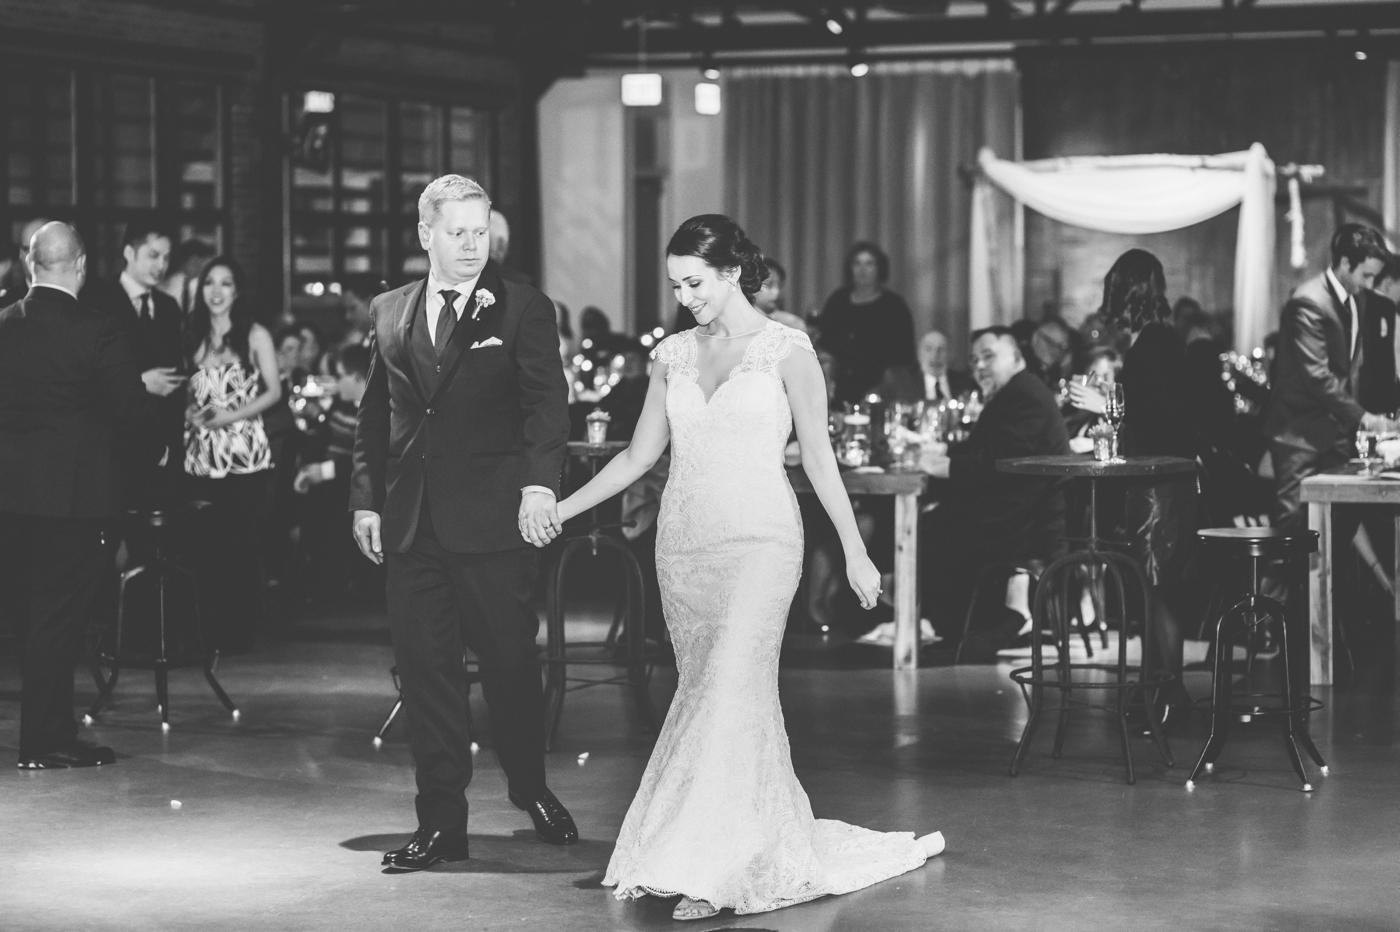 chicago-fine-art-wedding-photography-lintelman46